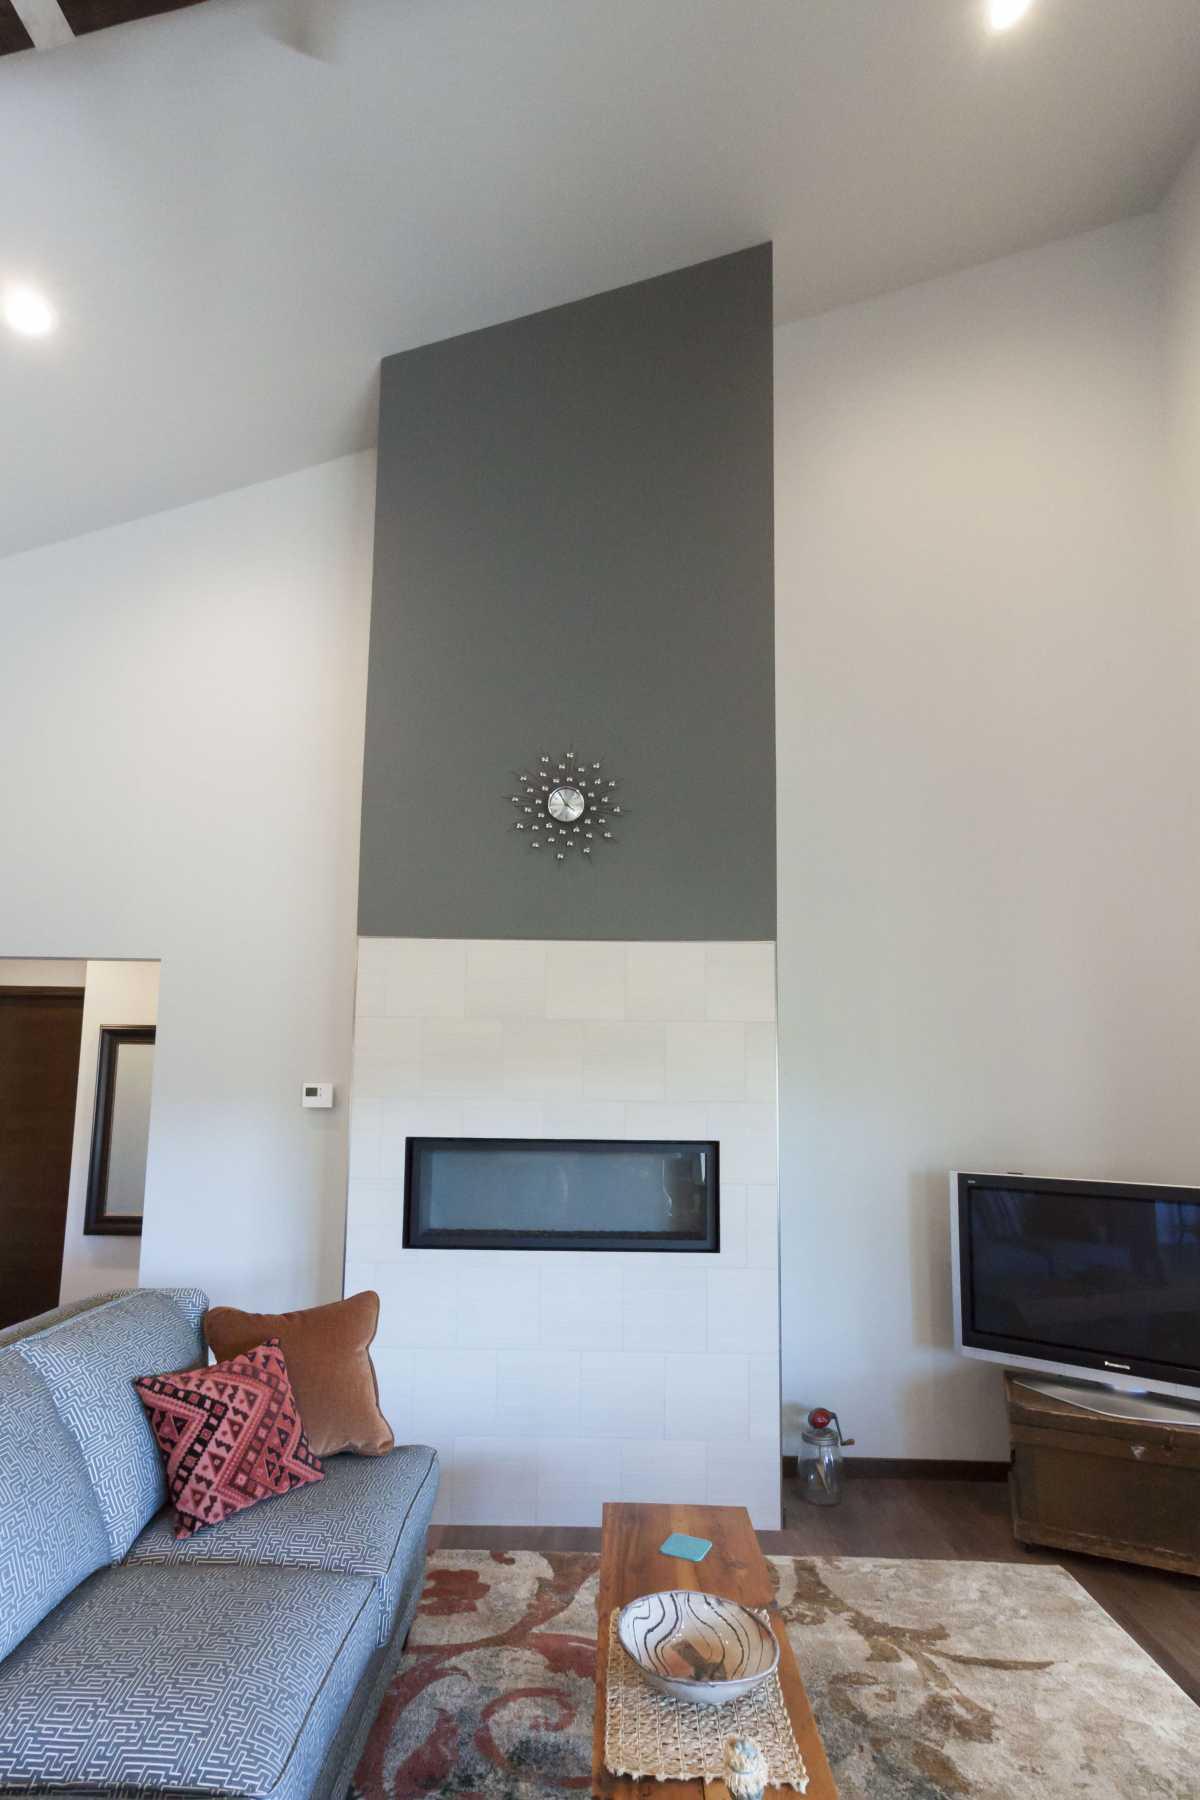 The sleek, tiled living room fireplace.